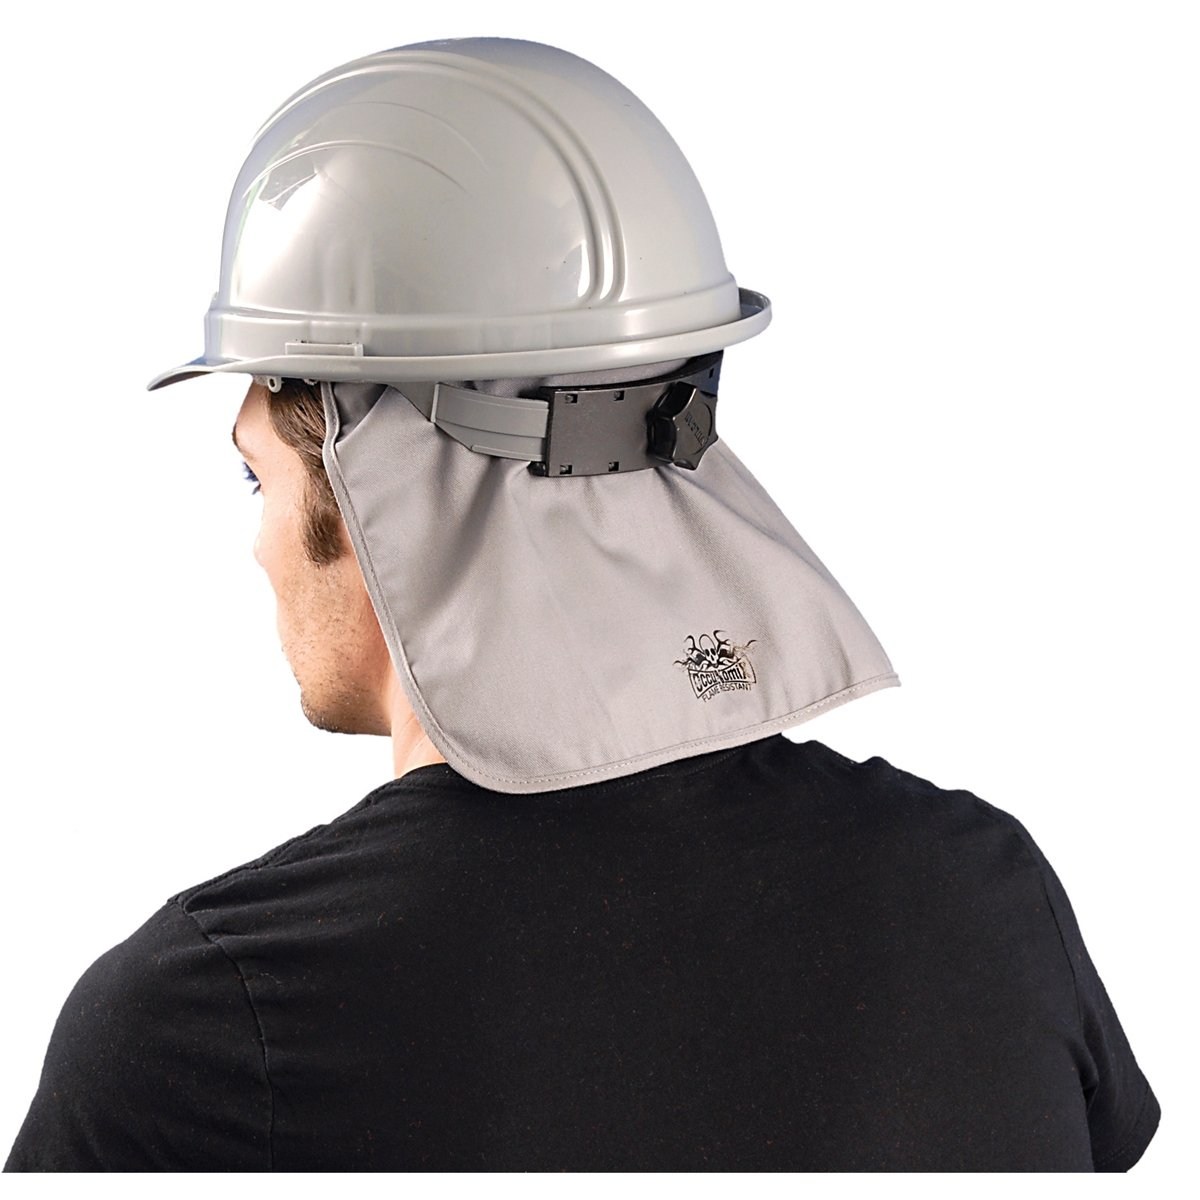 Hard Hat Cooling Pad w/ Neck Shade, Grey, One Size, Flame Retardant, #969